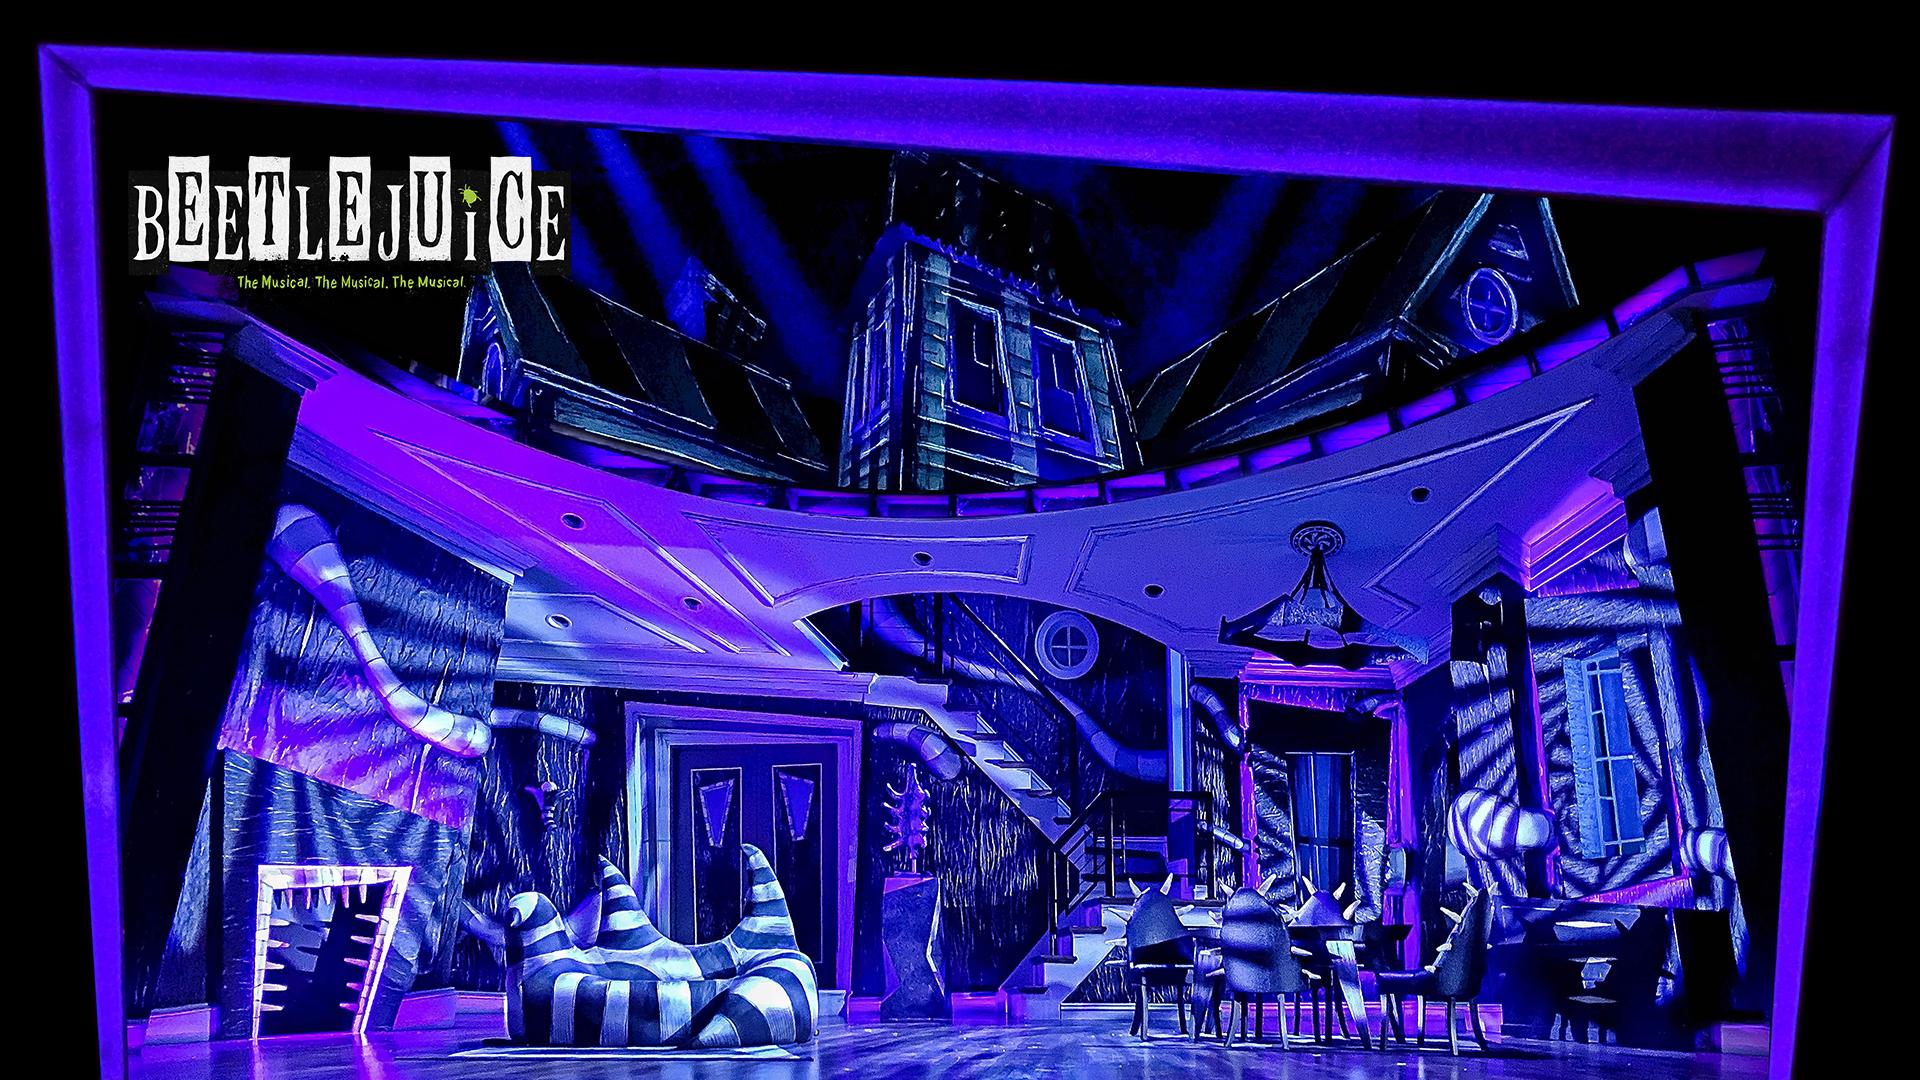 Image from Beetlejuice Broadway